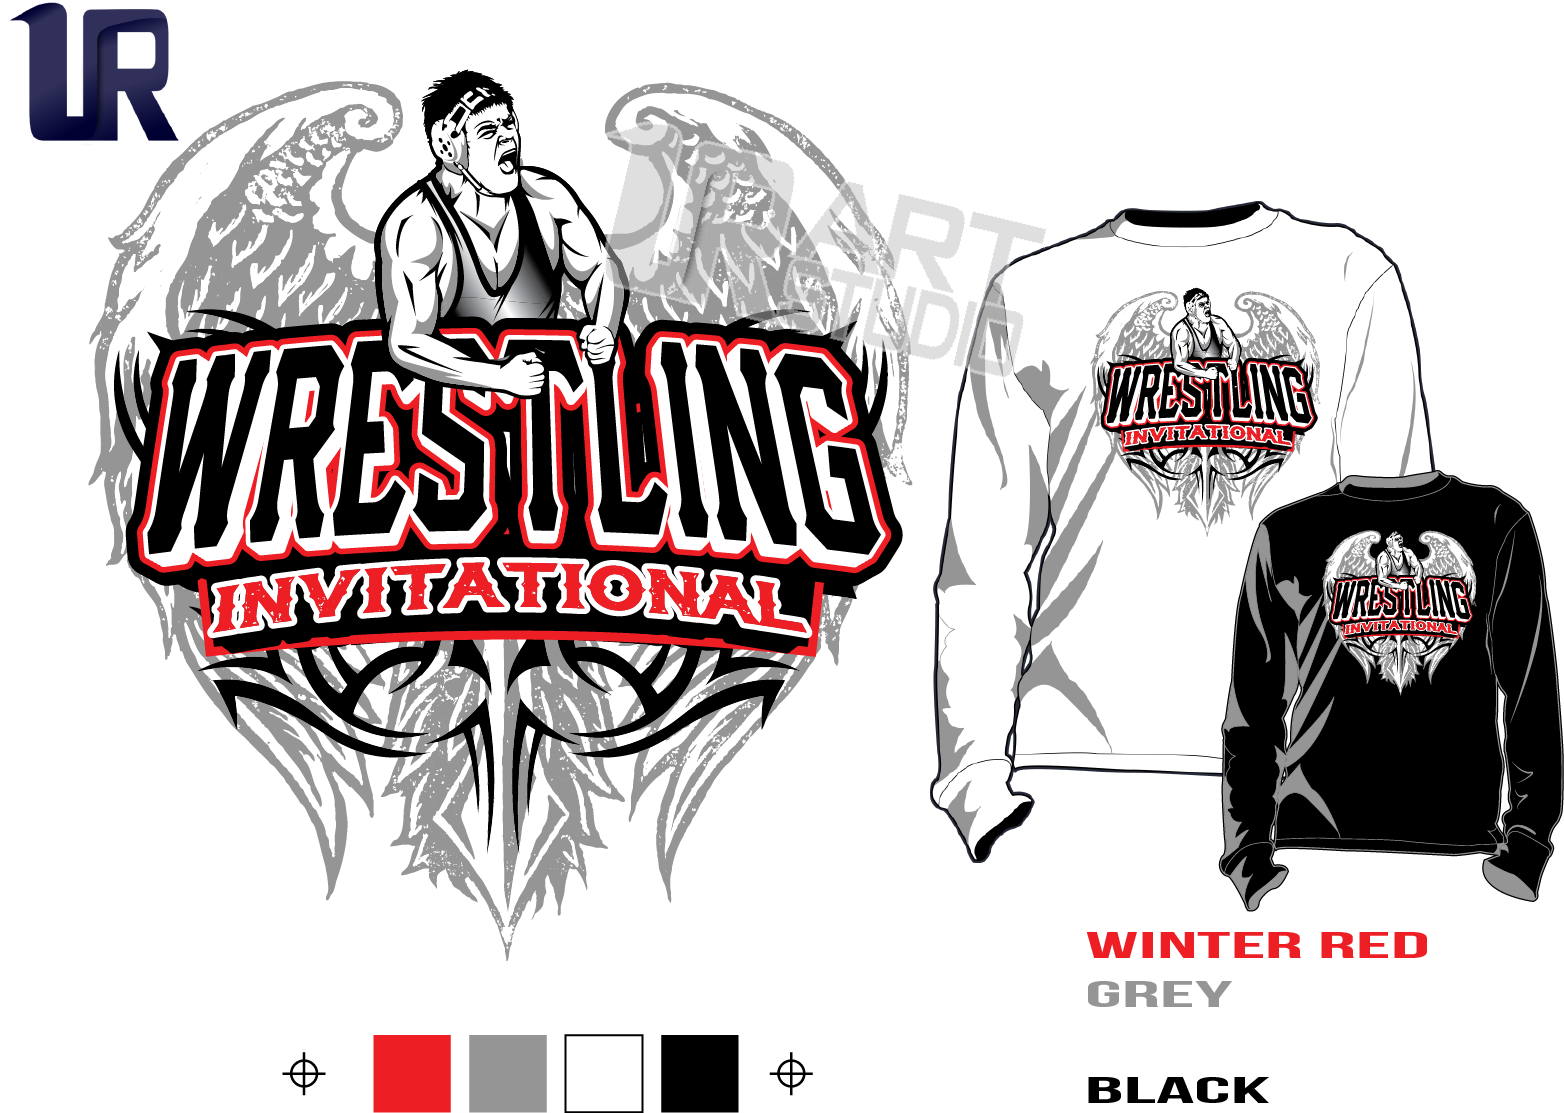 WRESTLING INVITATIONAL tshirt vector design separated 4 color